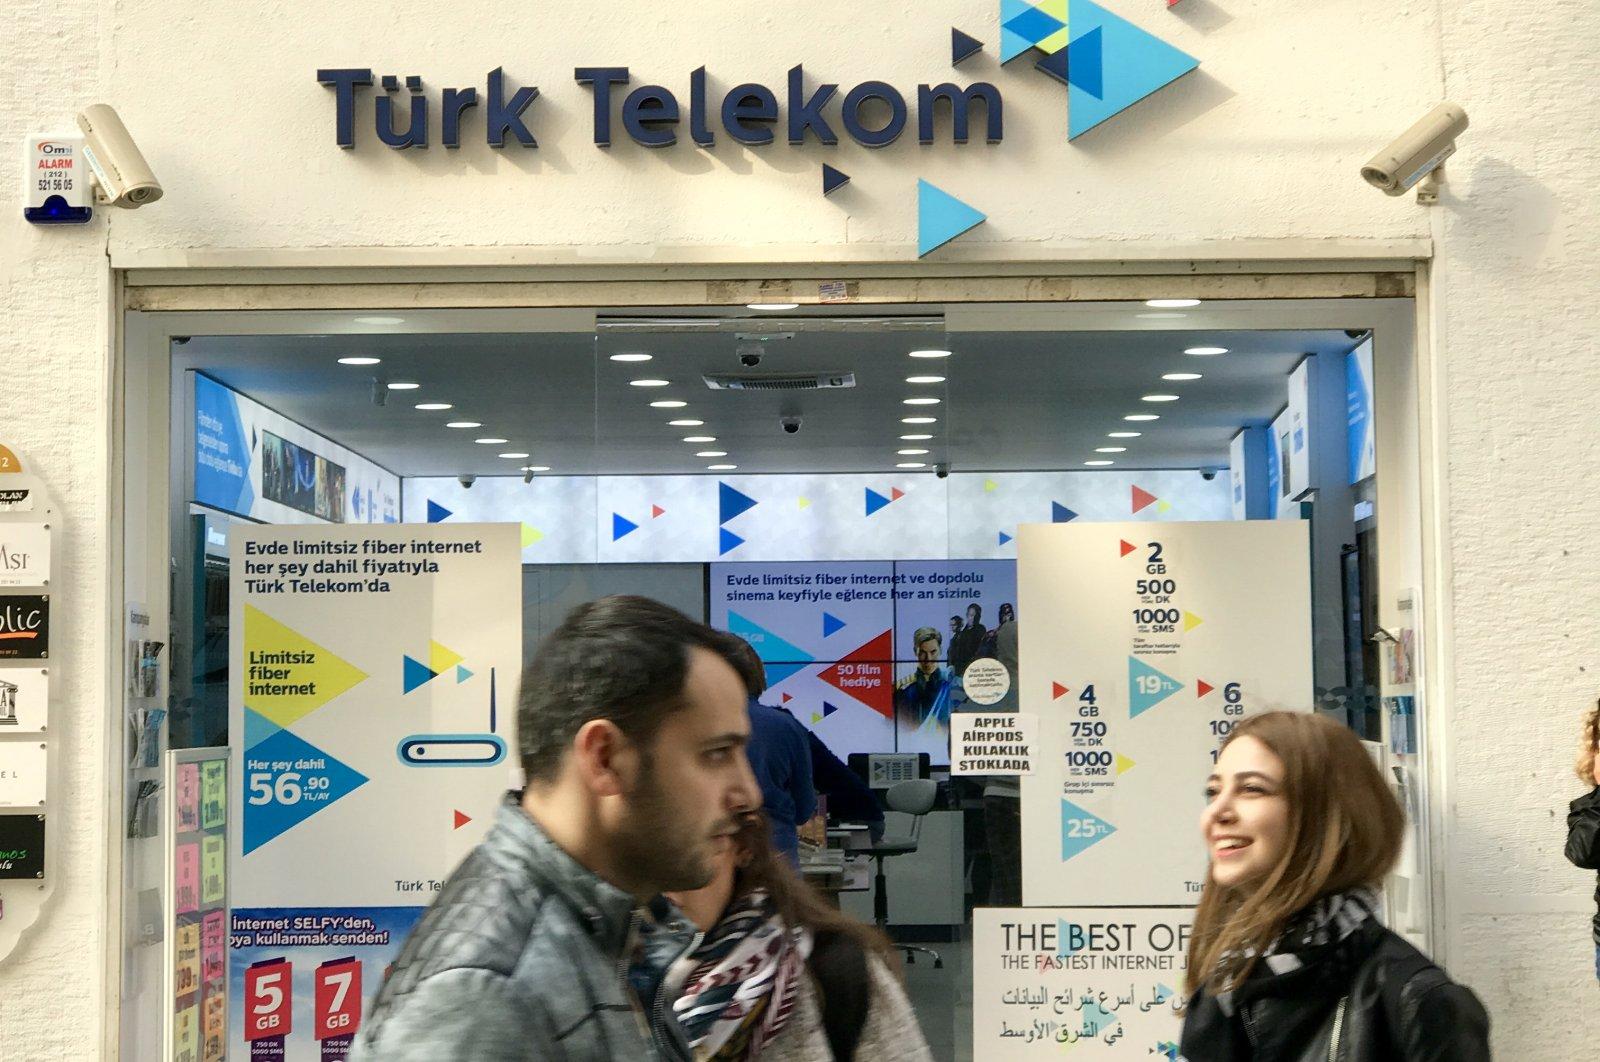 A Türk Telekom store is seen in Istanbul's Beyoğlu district in this undated photo. (iStock Photo)